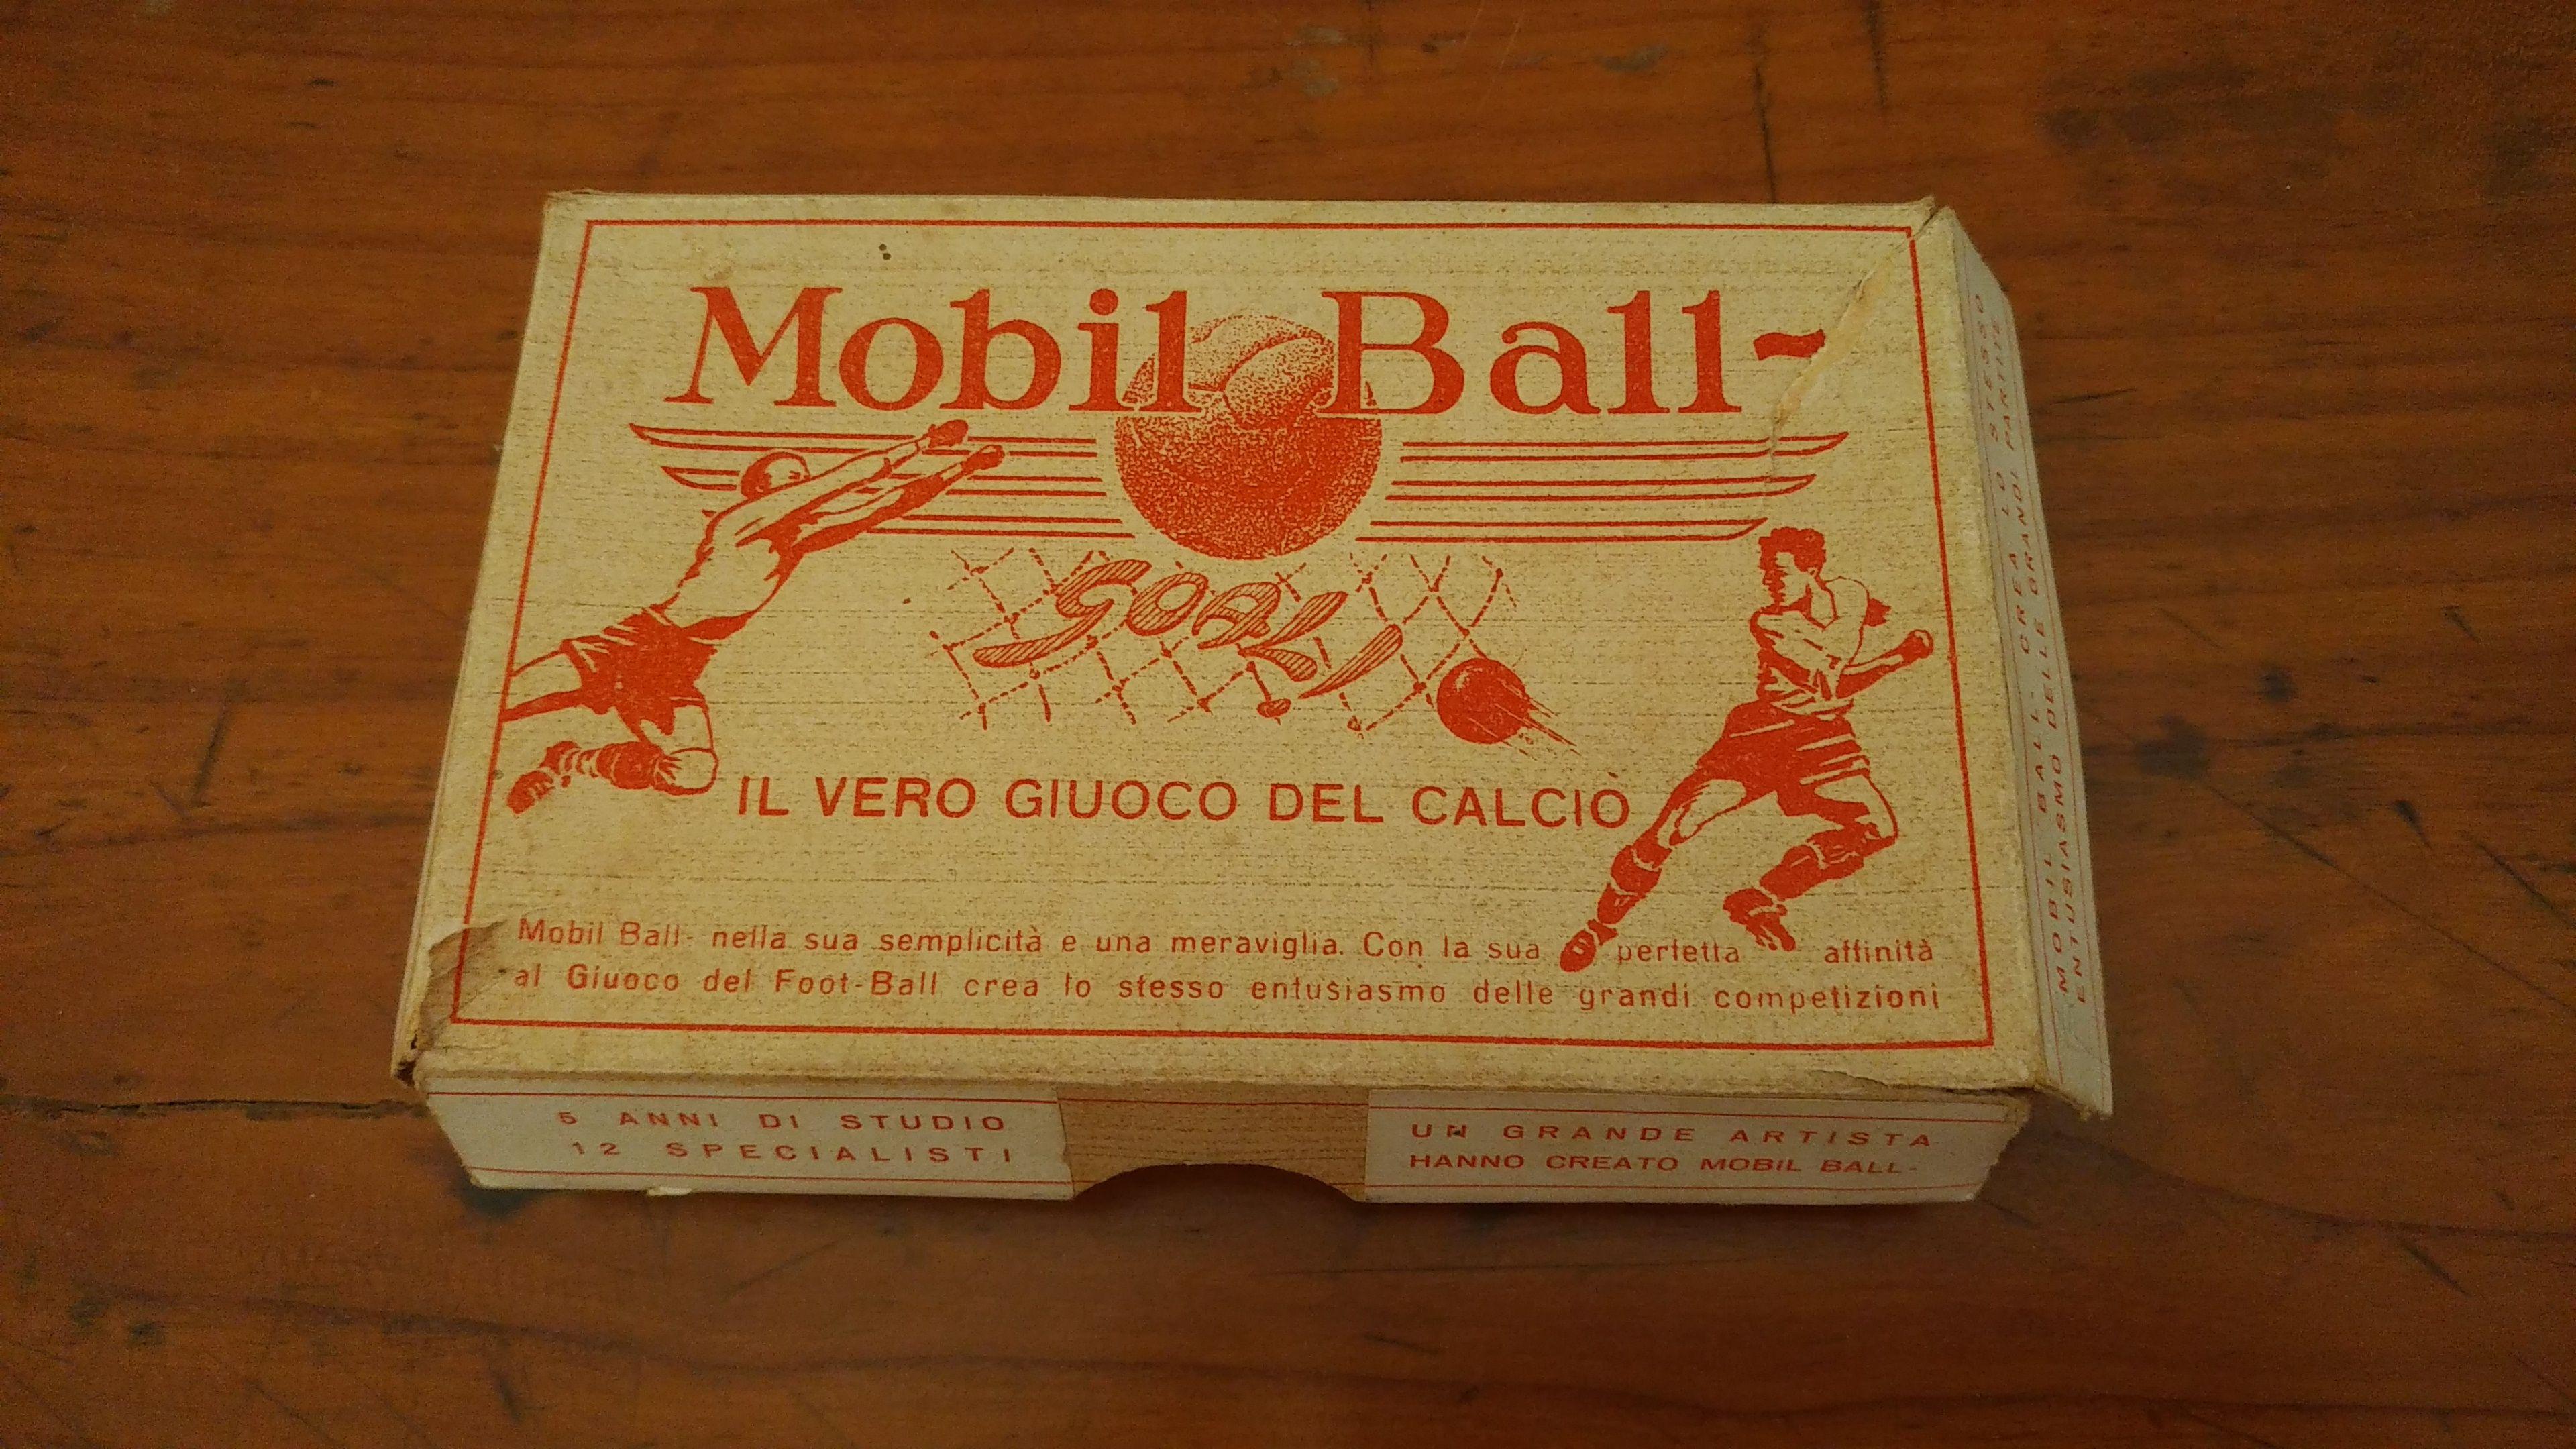 Mobil Ball-